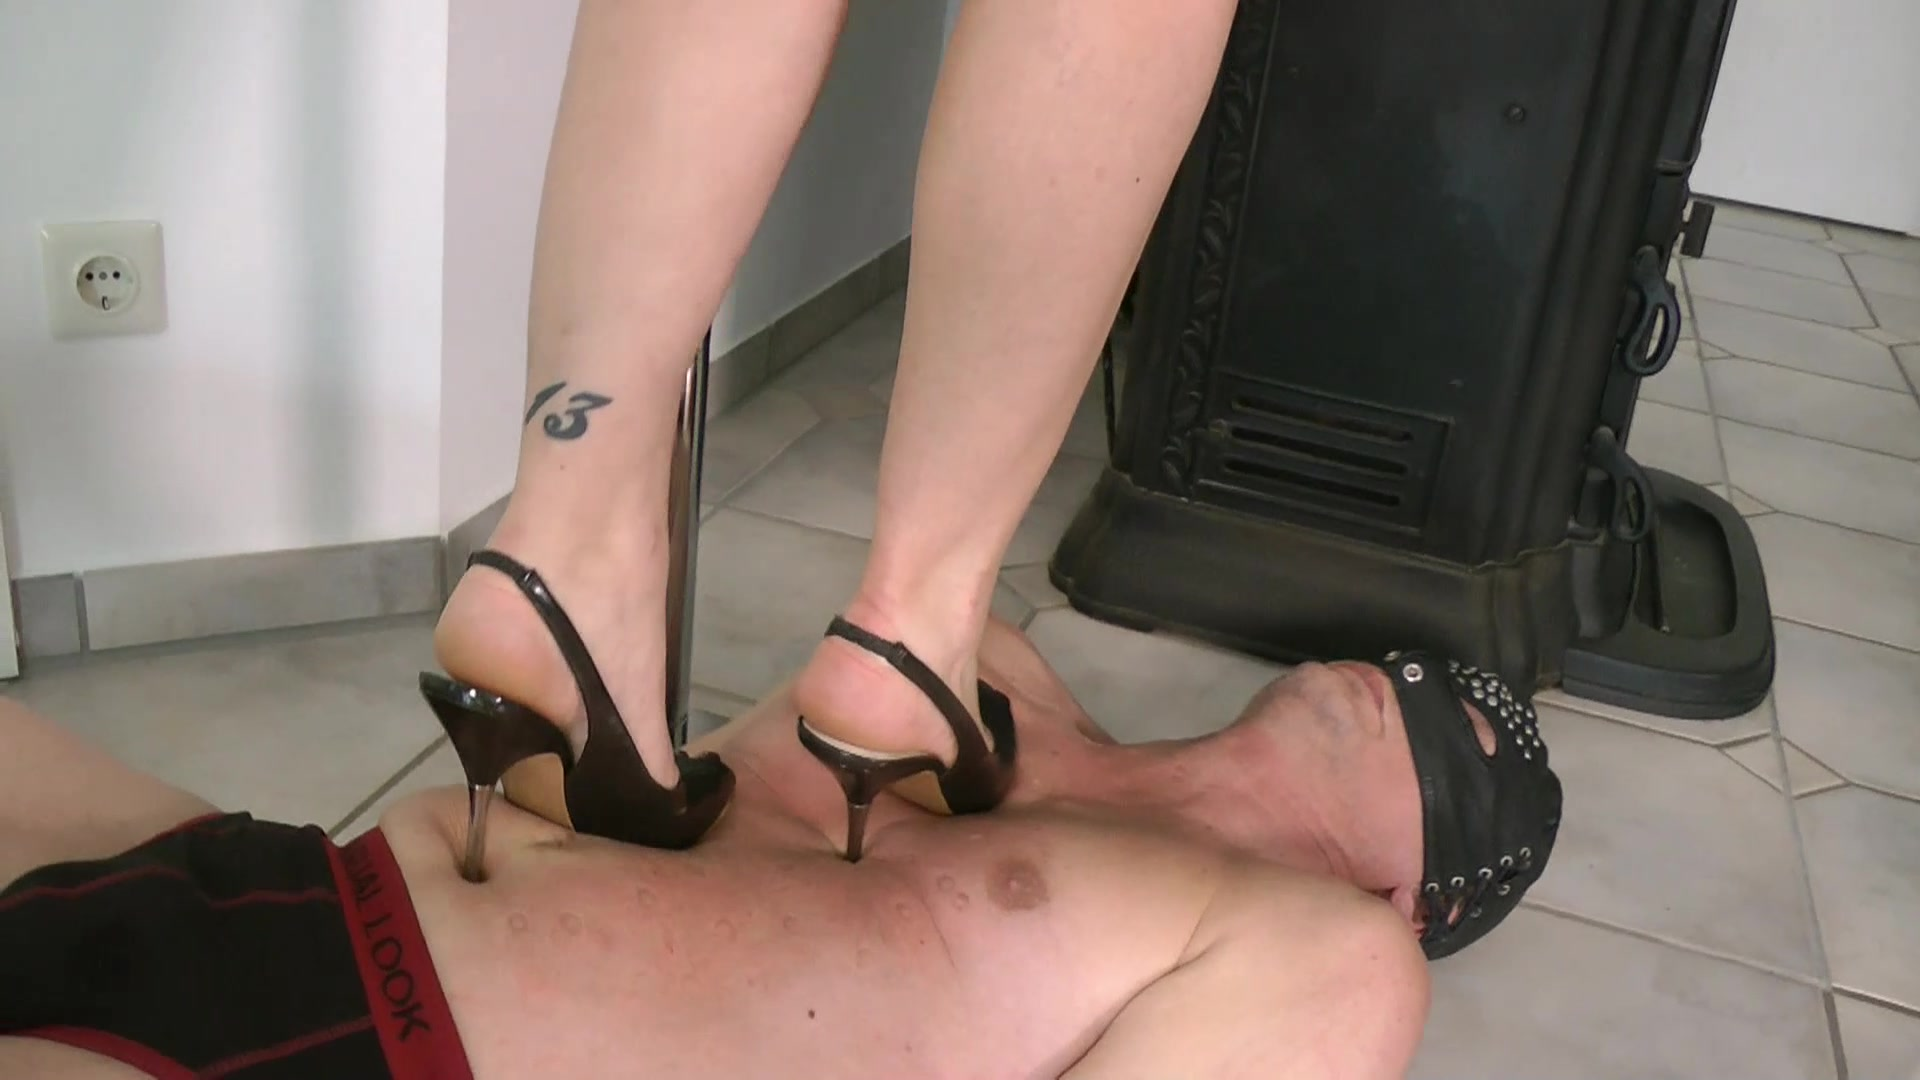 Competitive high heel trampling